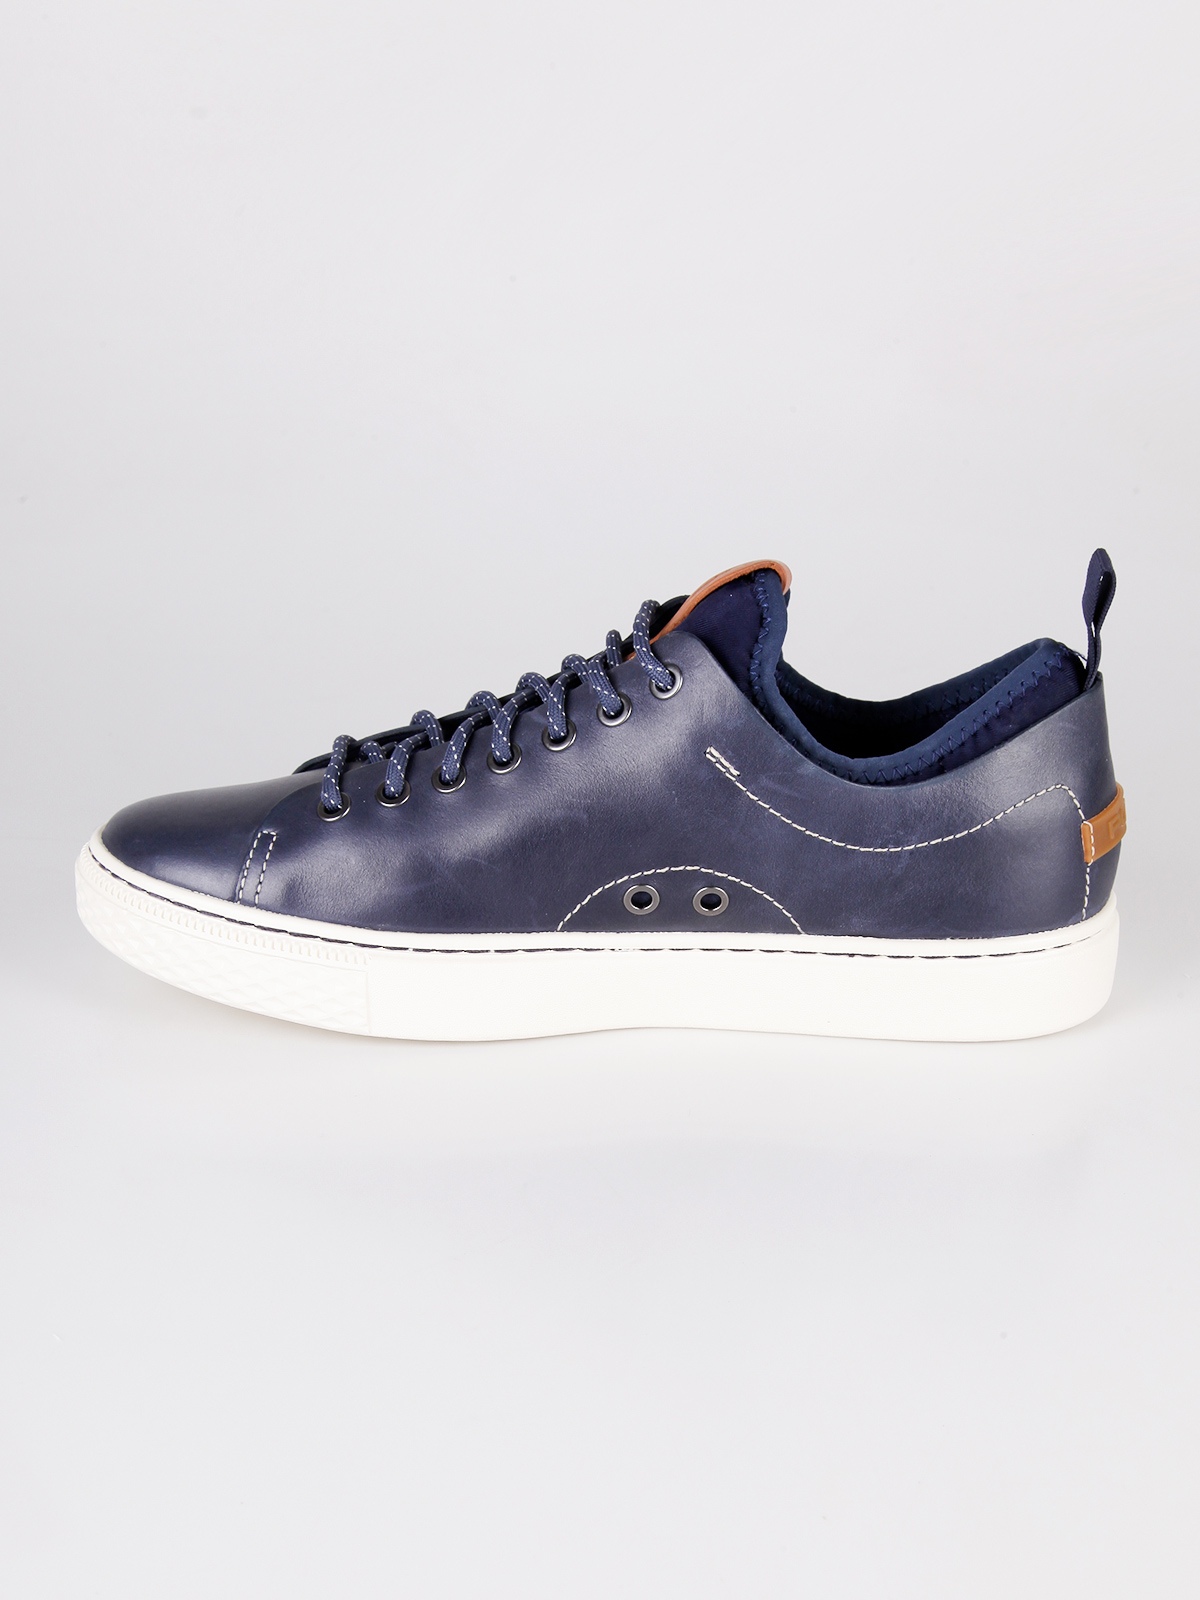 Cuir bleu Dunovin Sneakers Dunovin Cuir Sneakers Sneakers En En En Cuir bleu Dunovin LSUpMVGqz